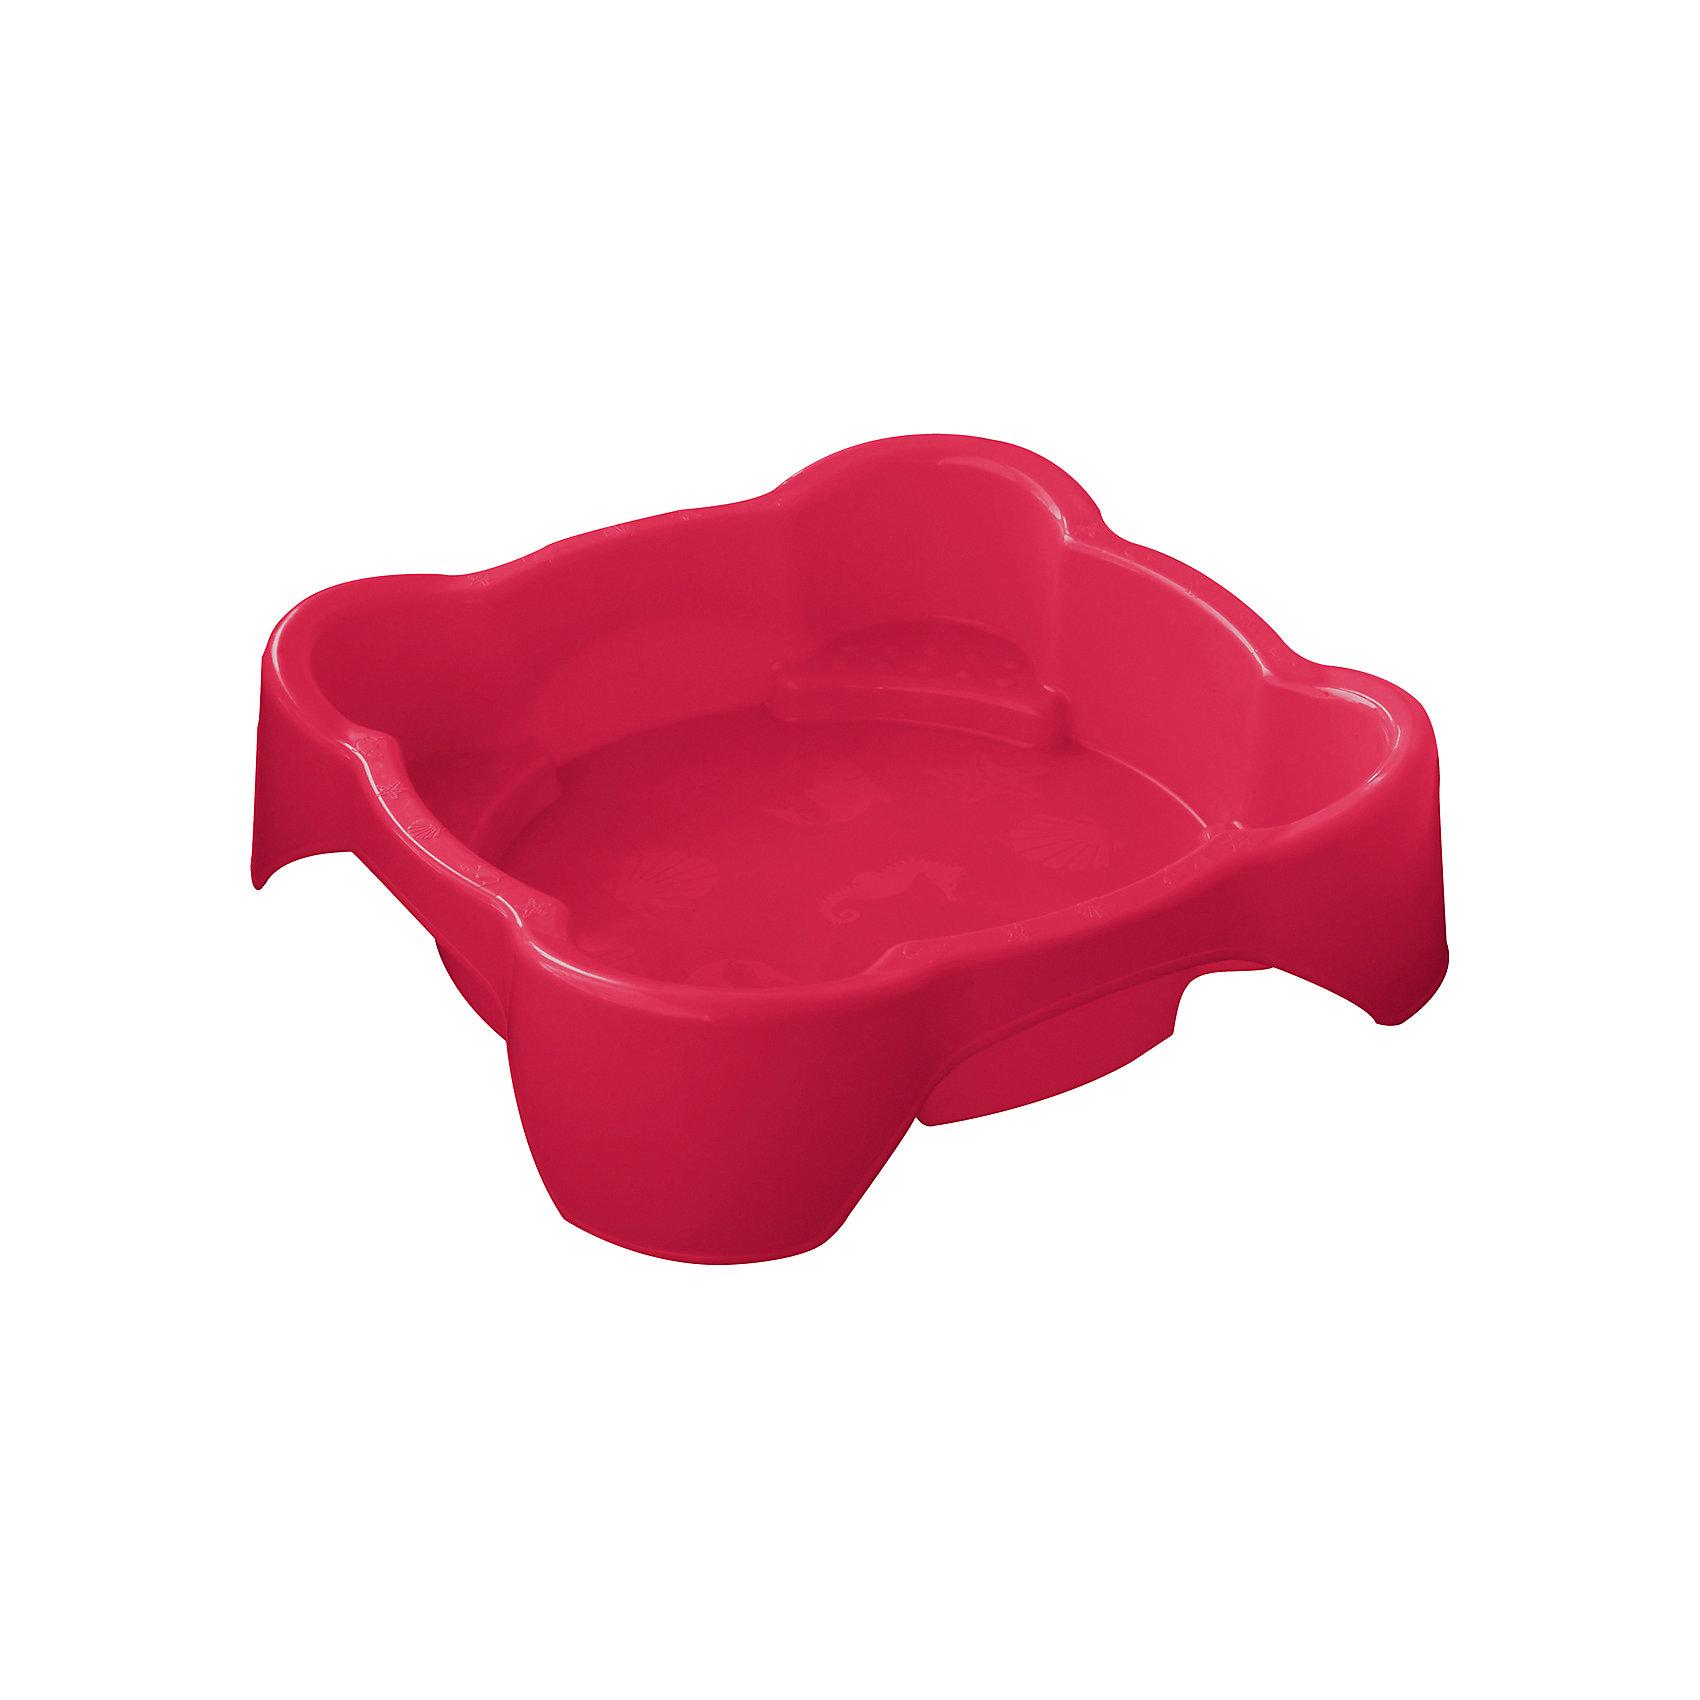 Песочница квадратная, красная, PalPlay